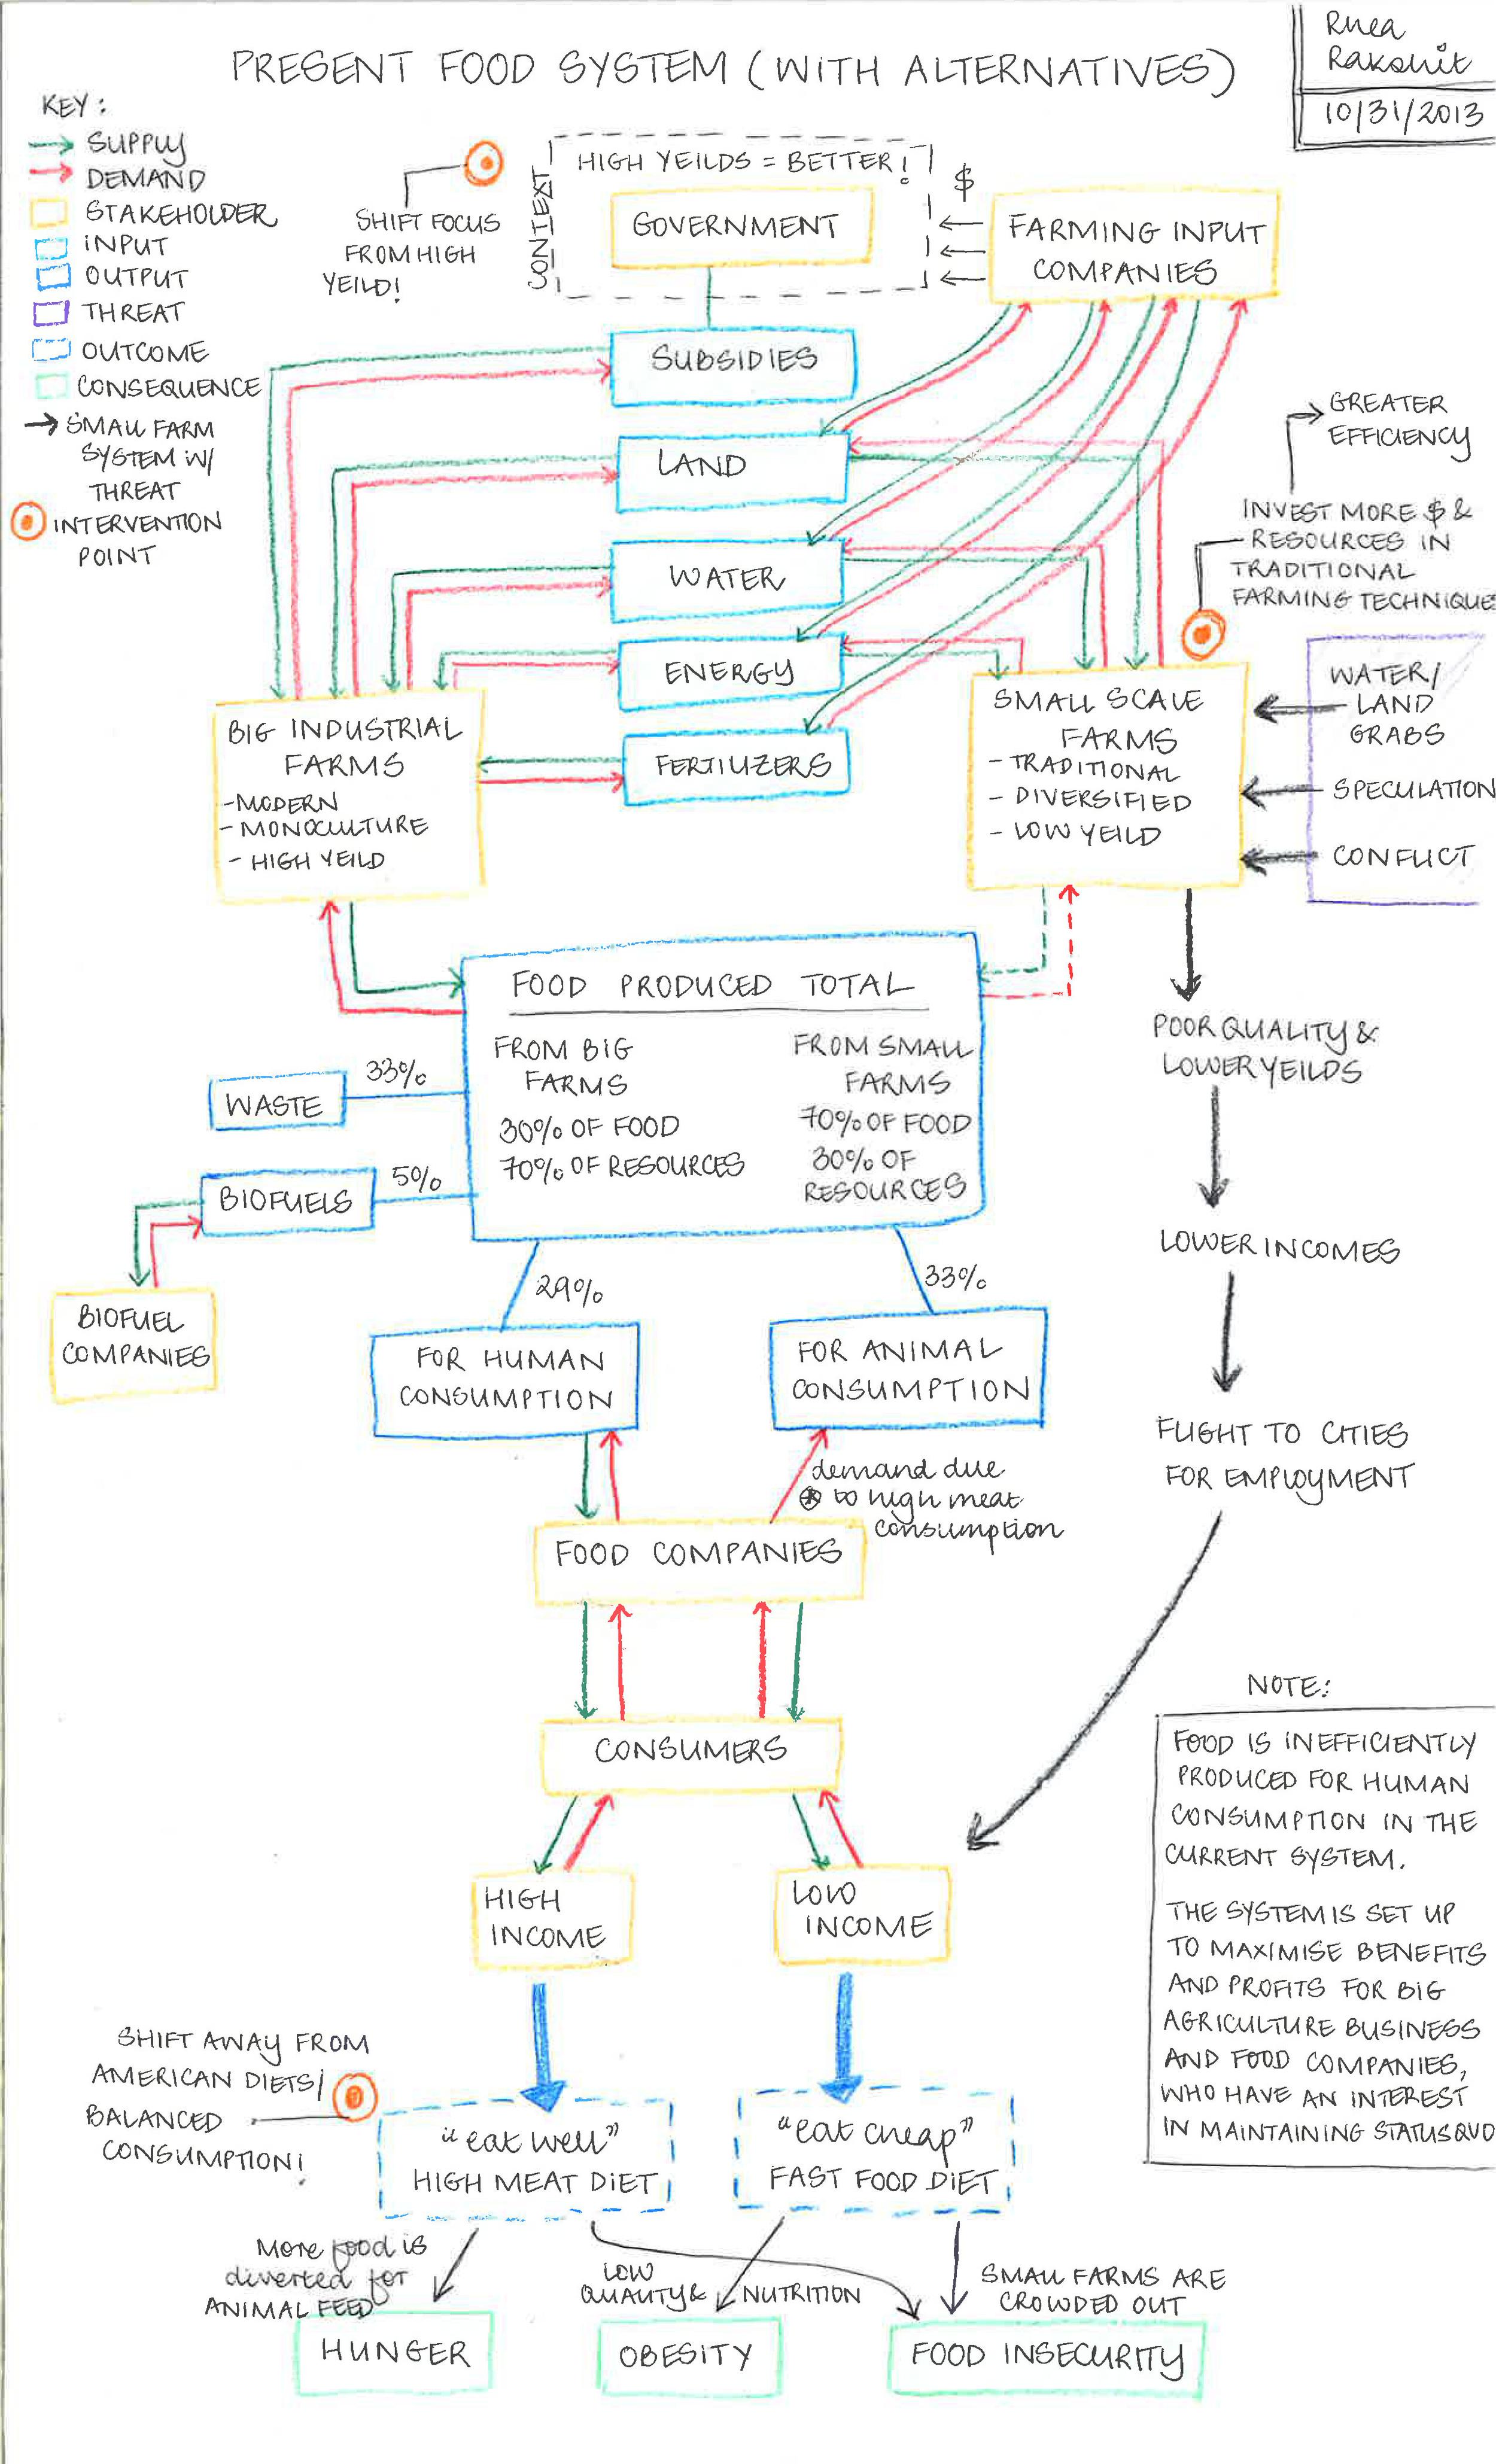 Food System Map - Rhea Rakshit.jpg